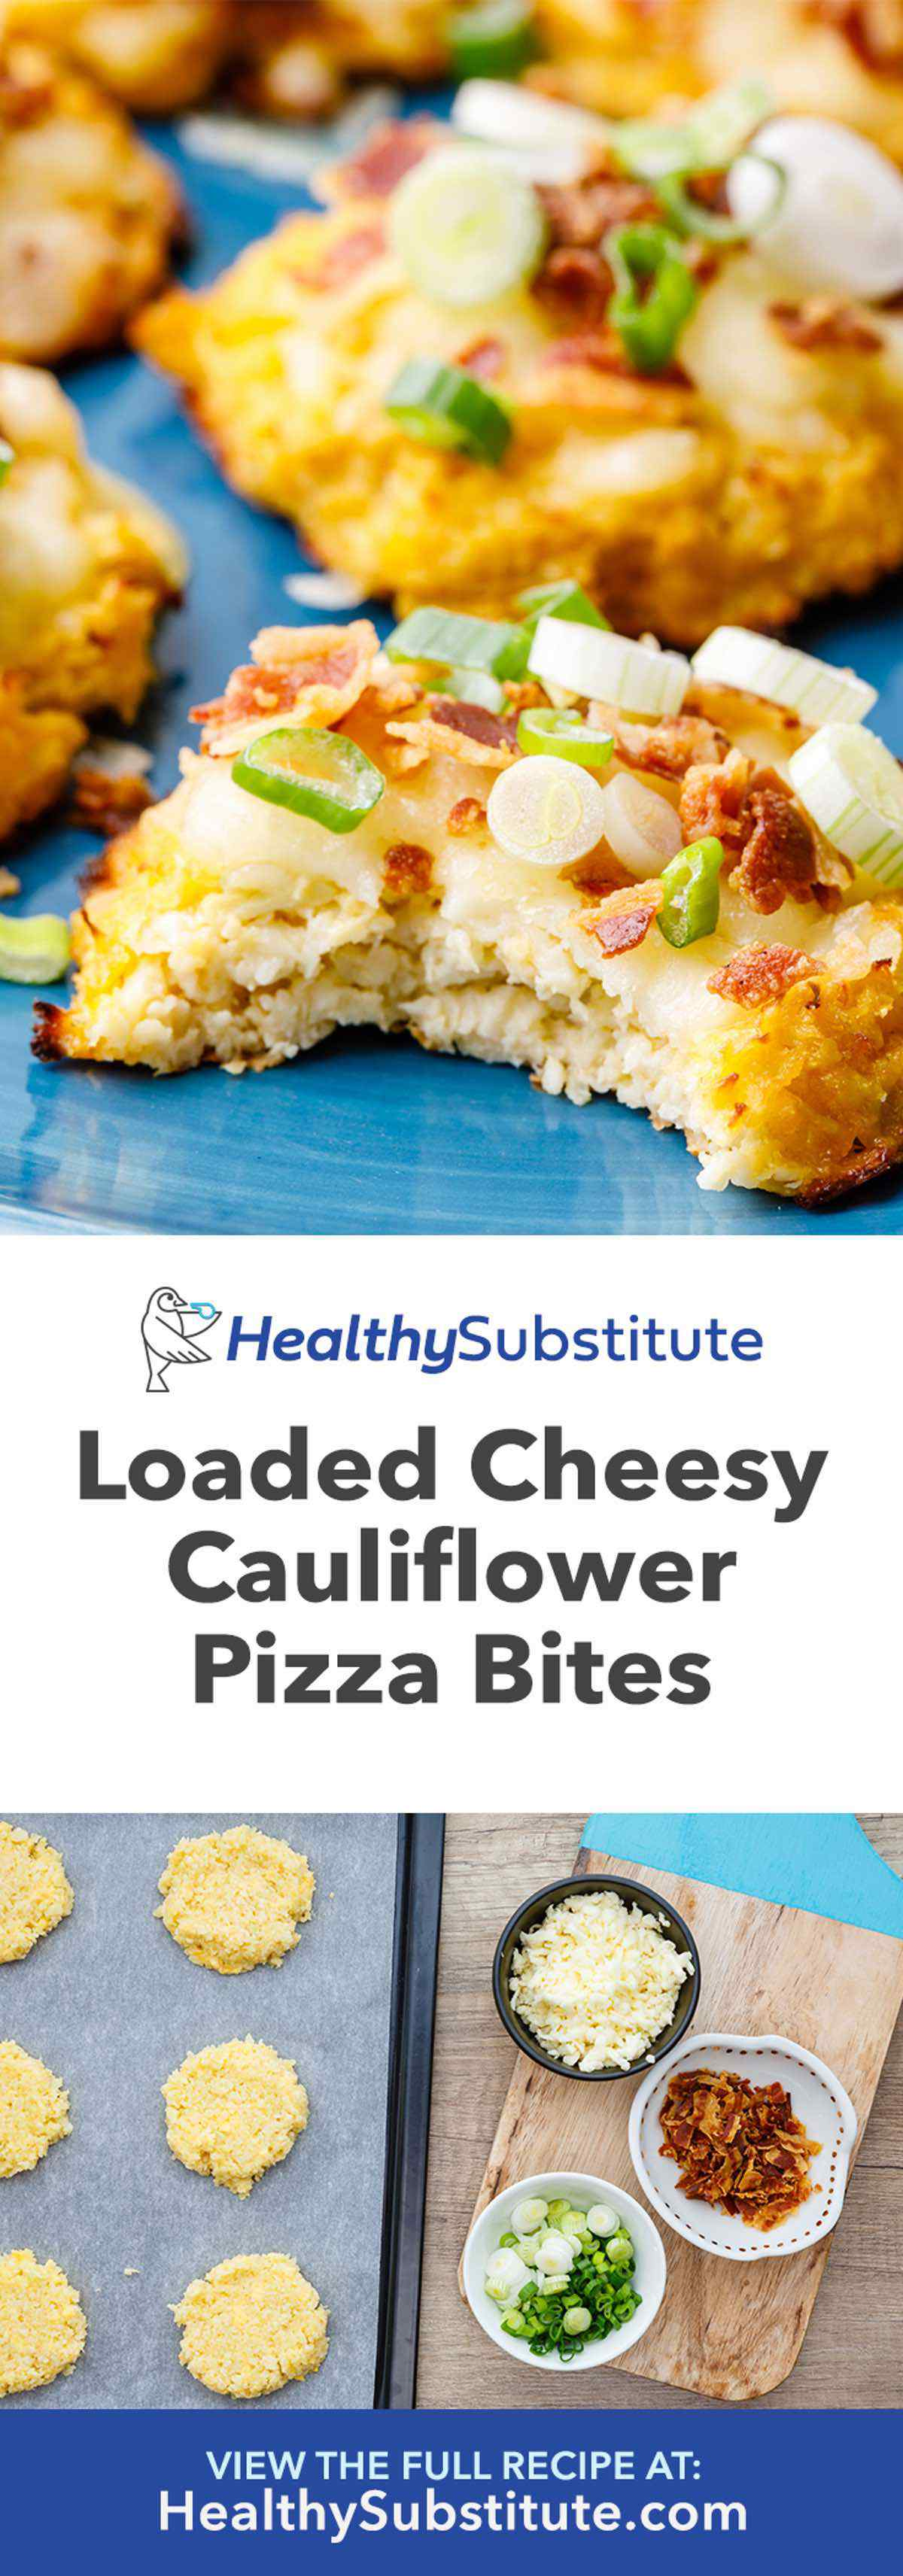 Loaded Cheesy Cauliflower Pizza Bites